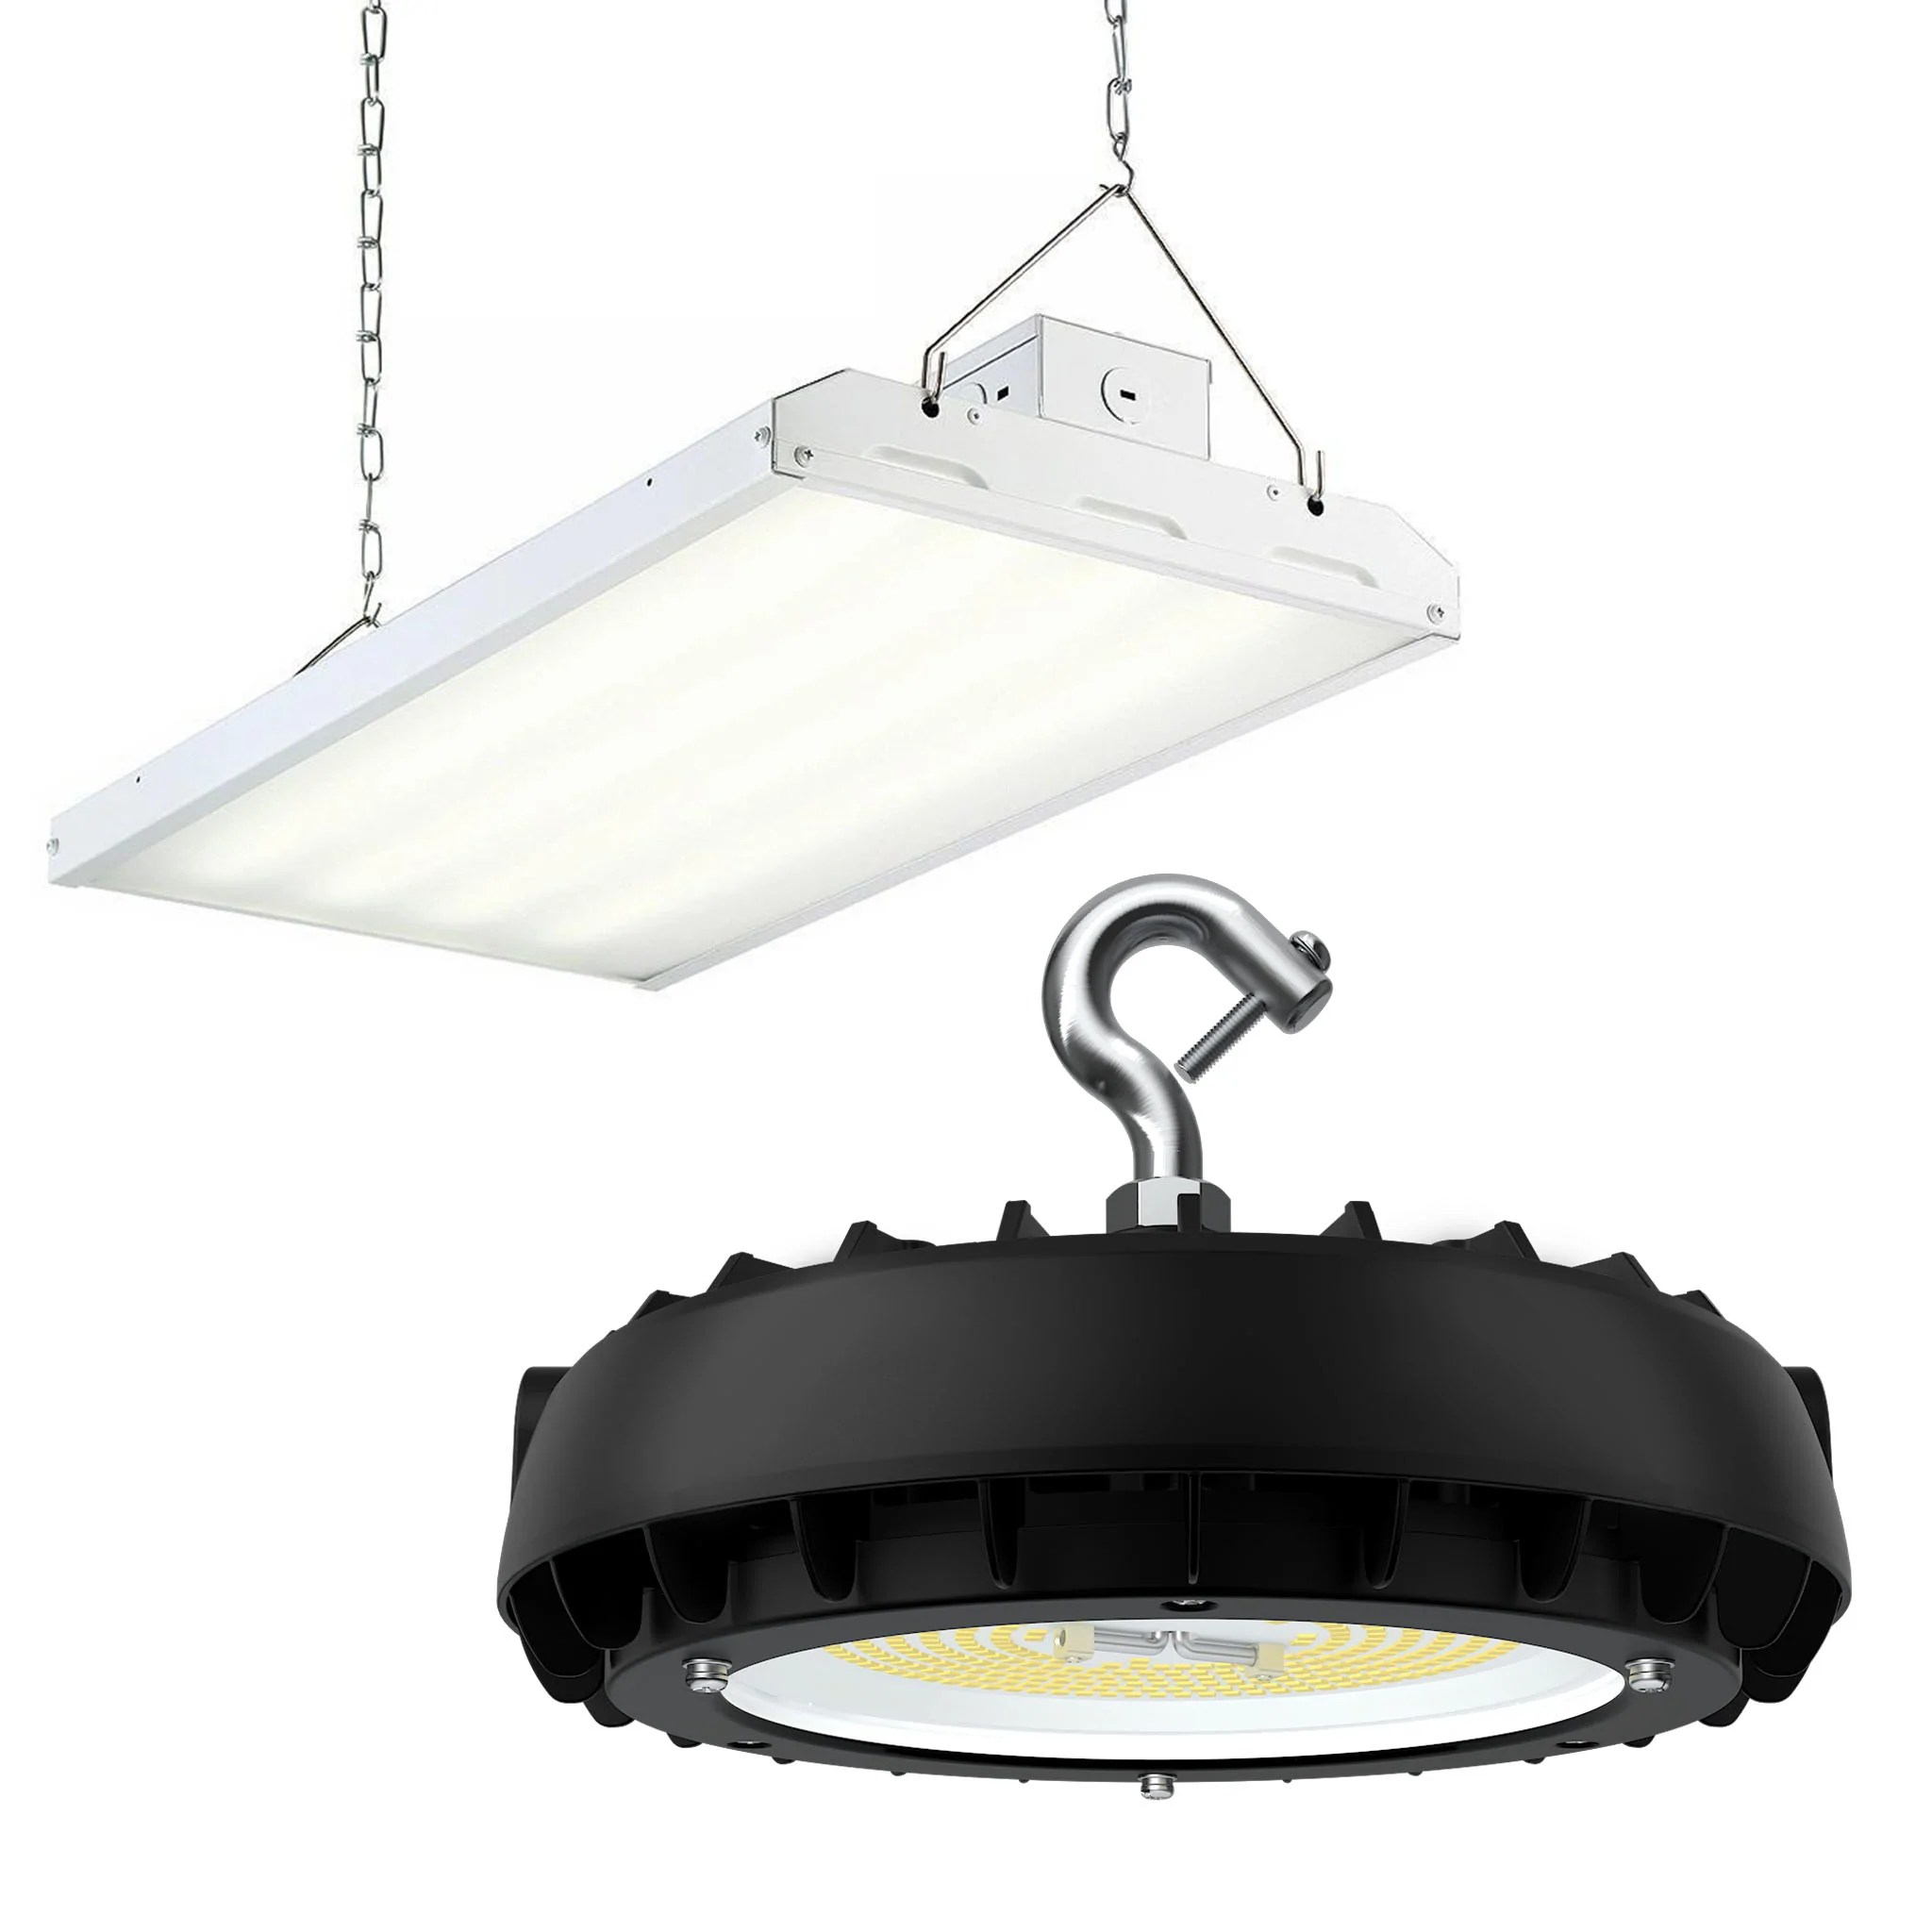 hight resolution of high bay lights lighting fixtures